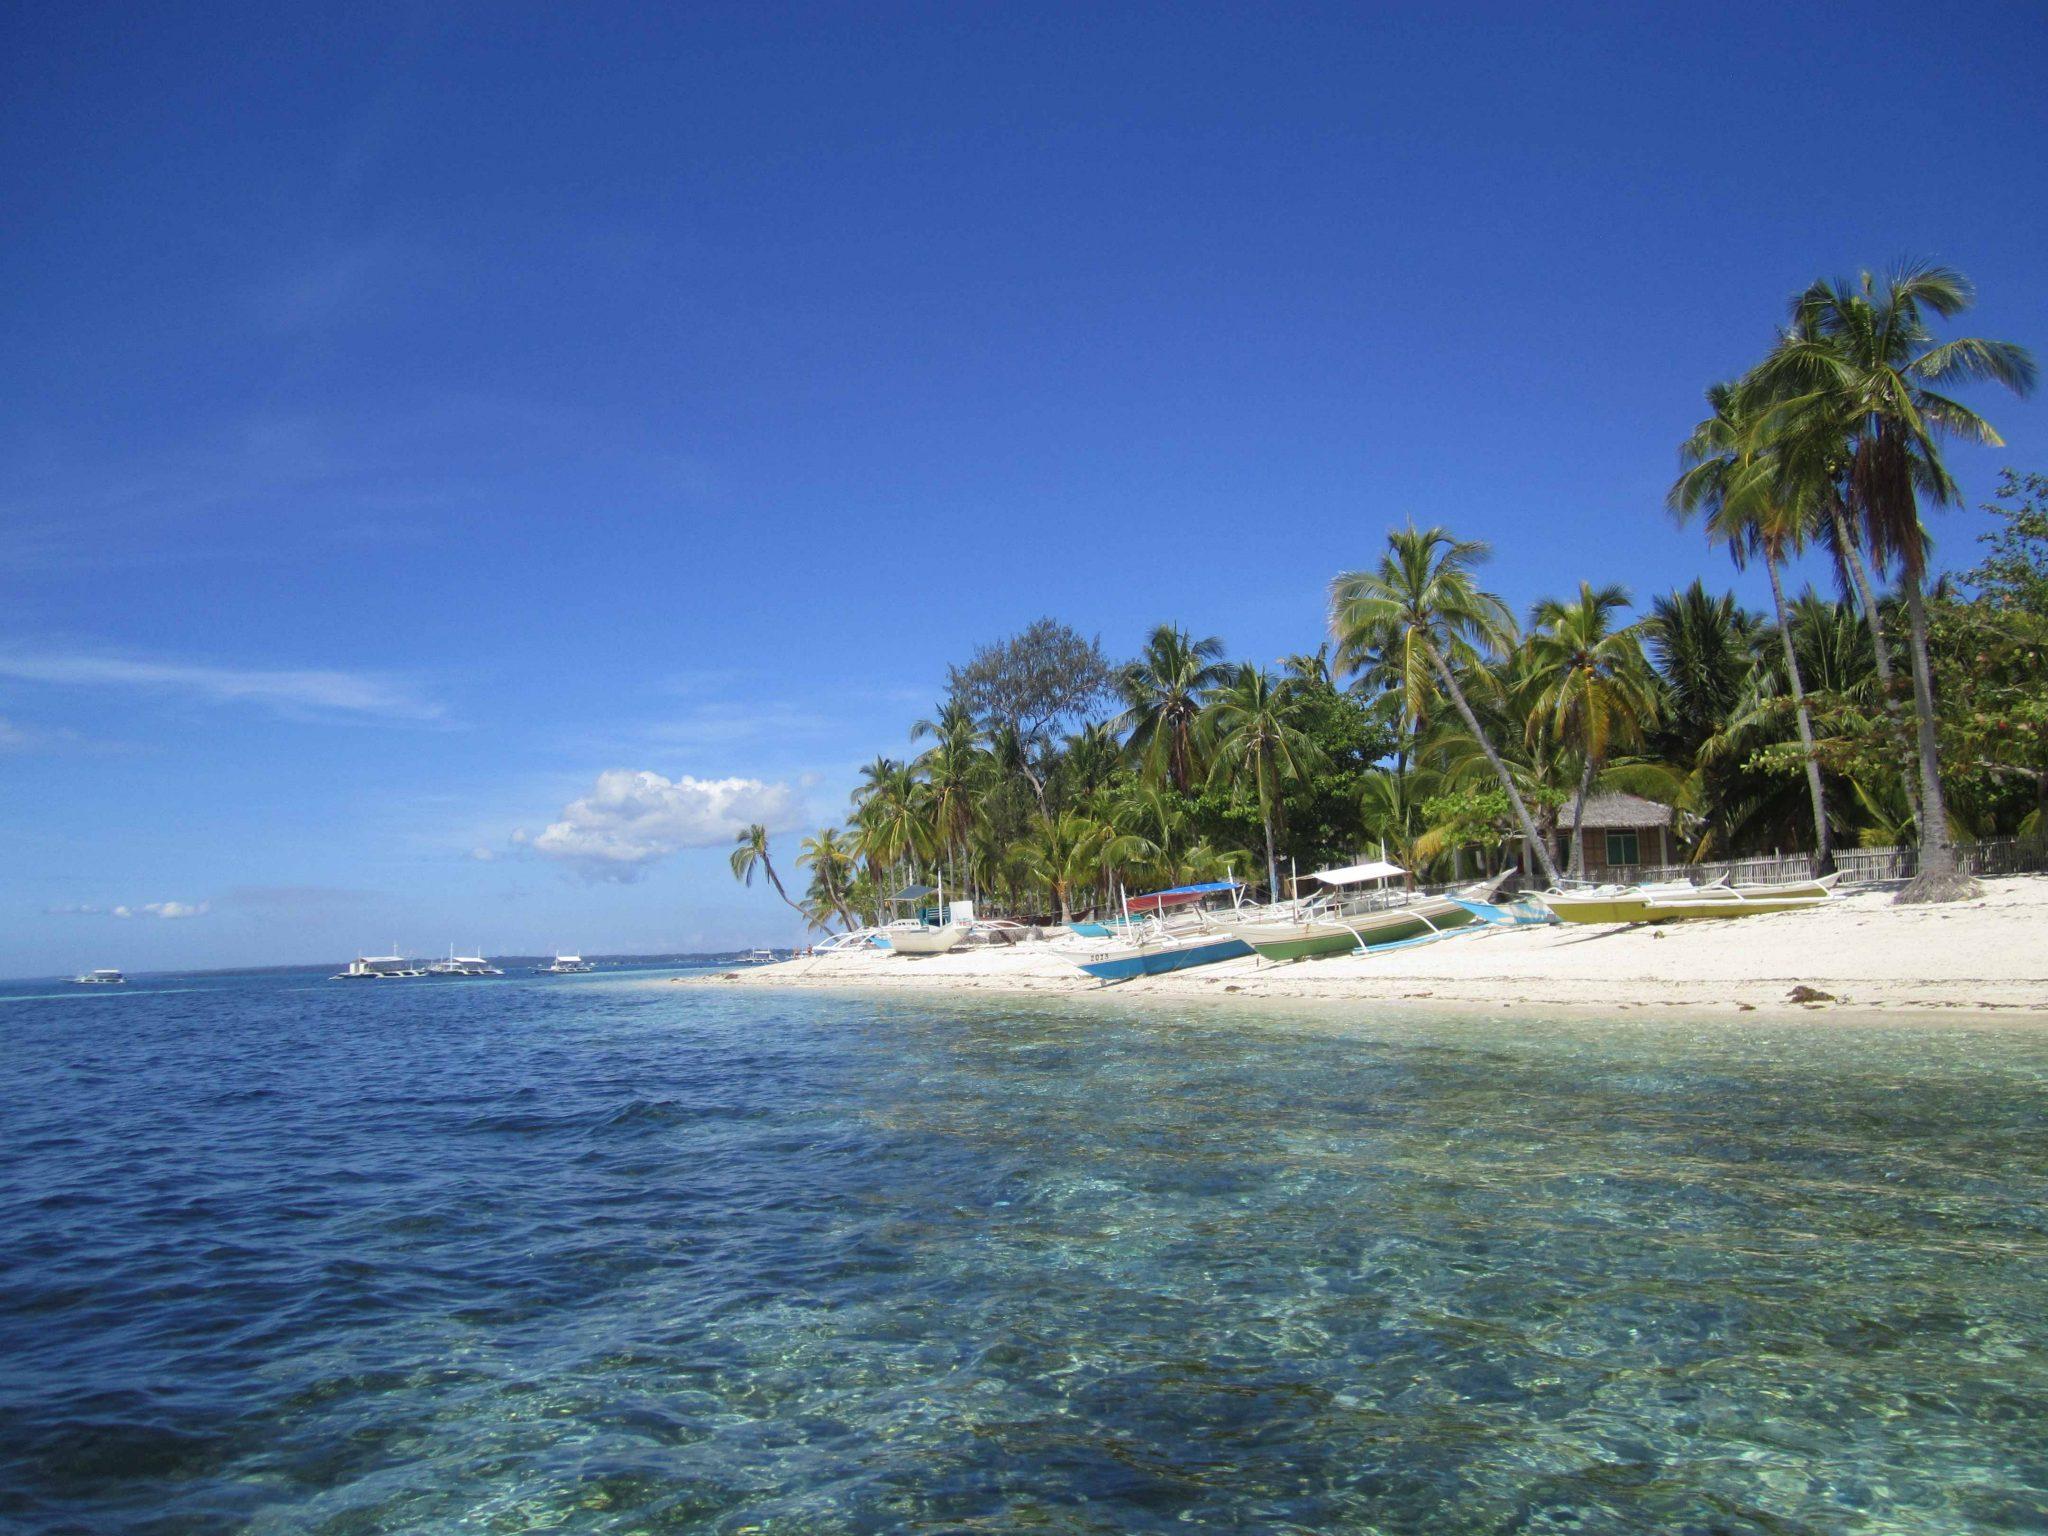 Malapascua Island Philippines  city photos : Malapascua Island in the Philippines 2